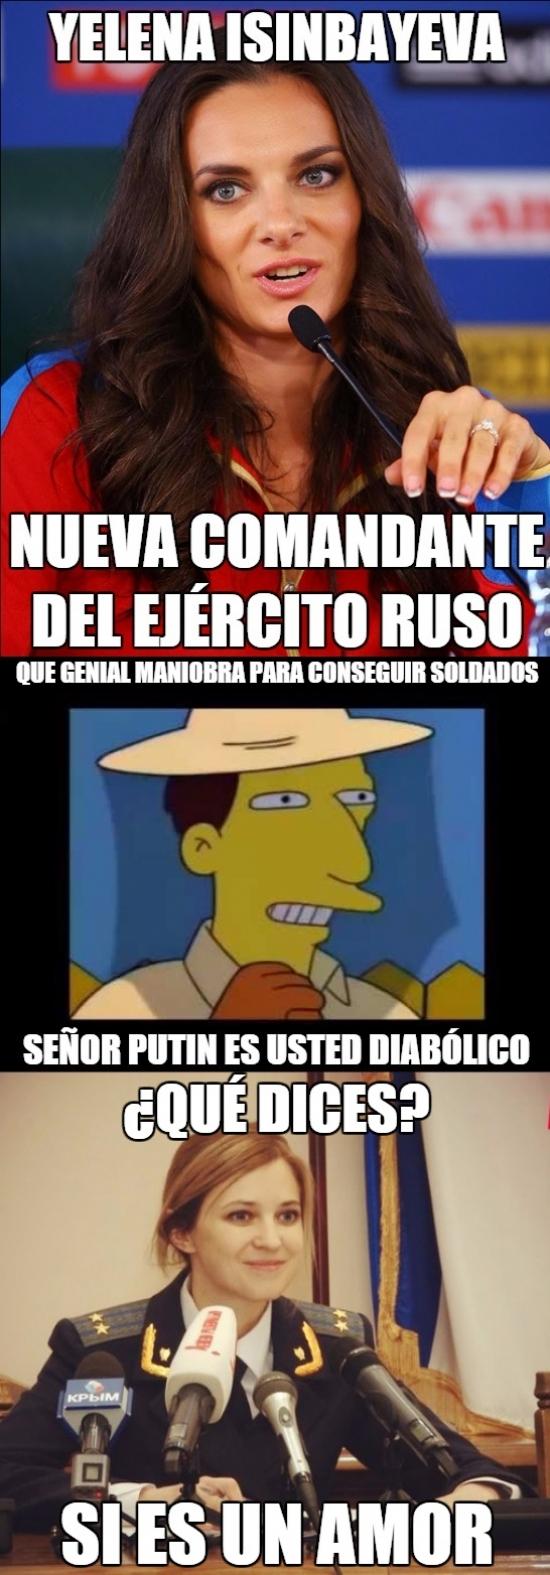 Meme_mix - Putin sabe cuál es la mejor manera de conquistar el mundo